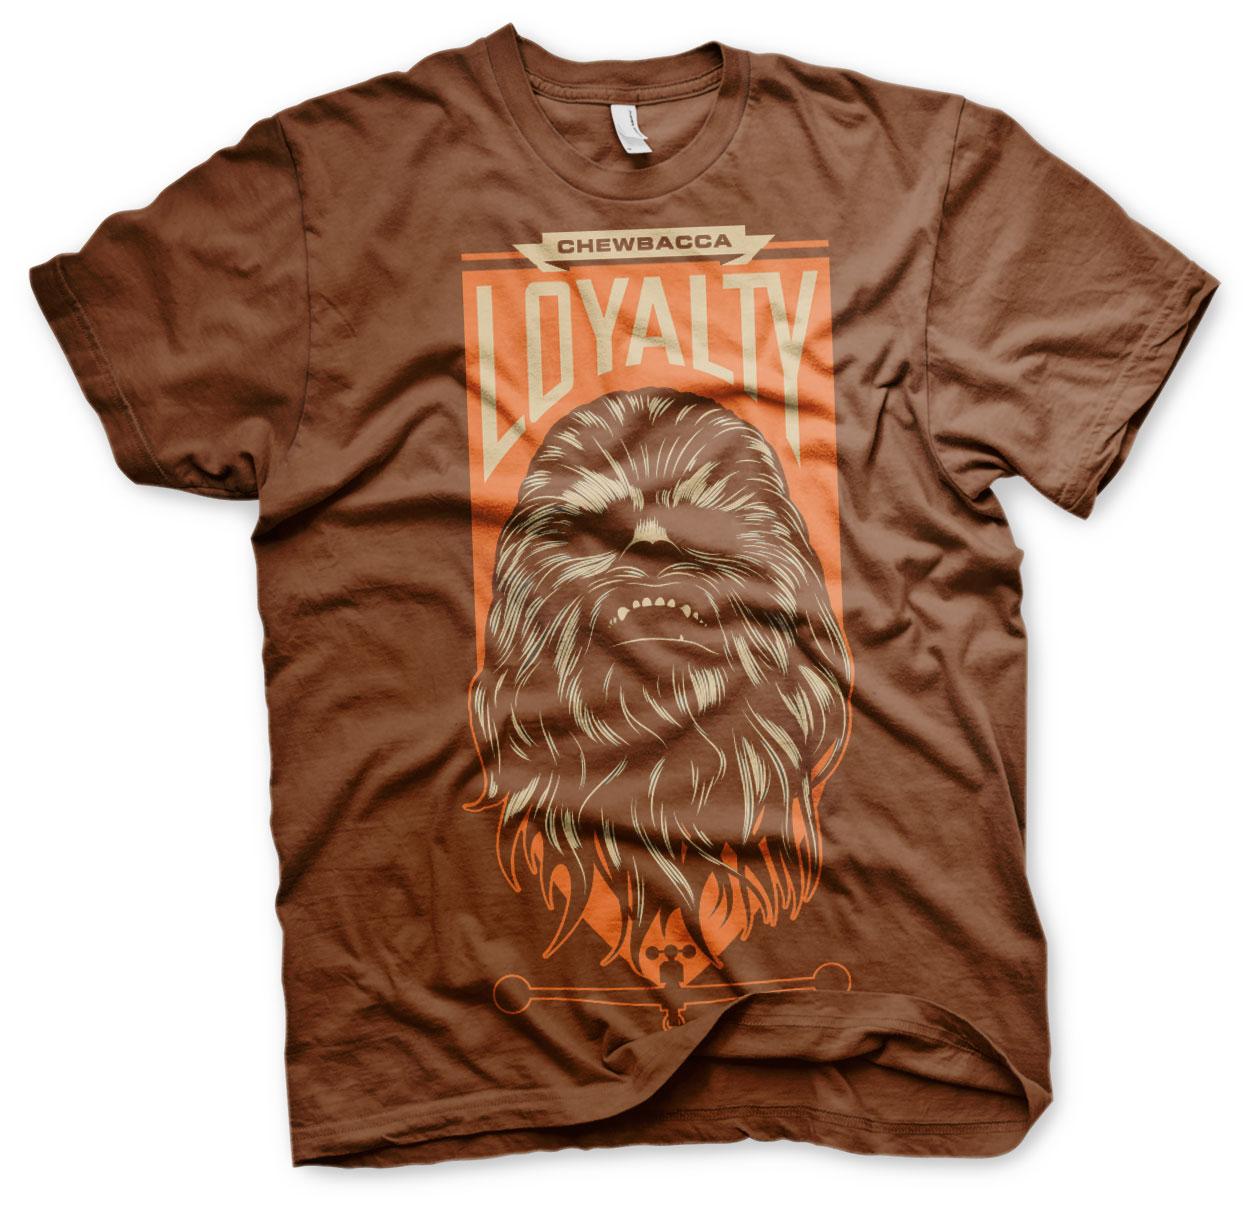 Chewbacca Loyalty T-Shirt